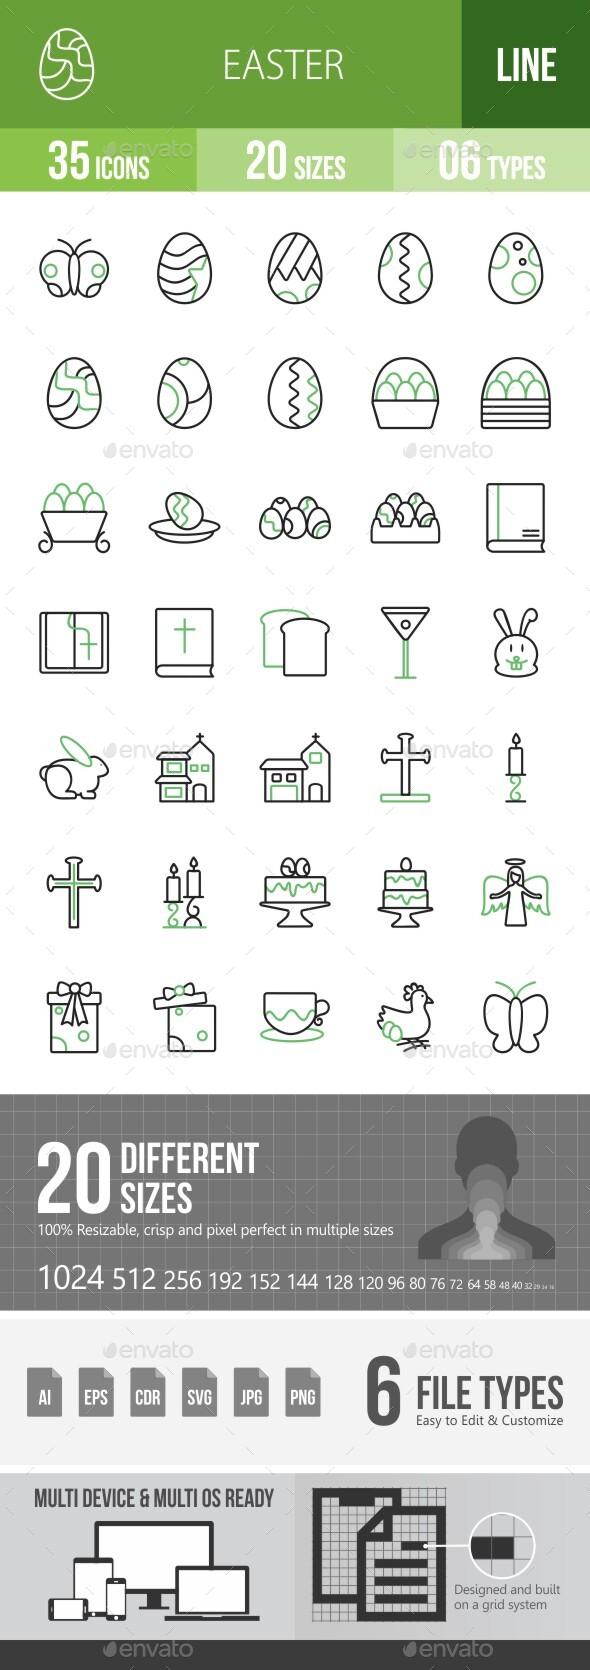 Easter Line Green & Black Icons Season III